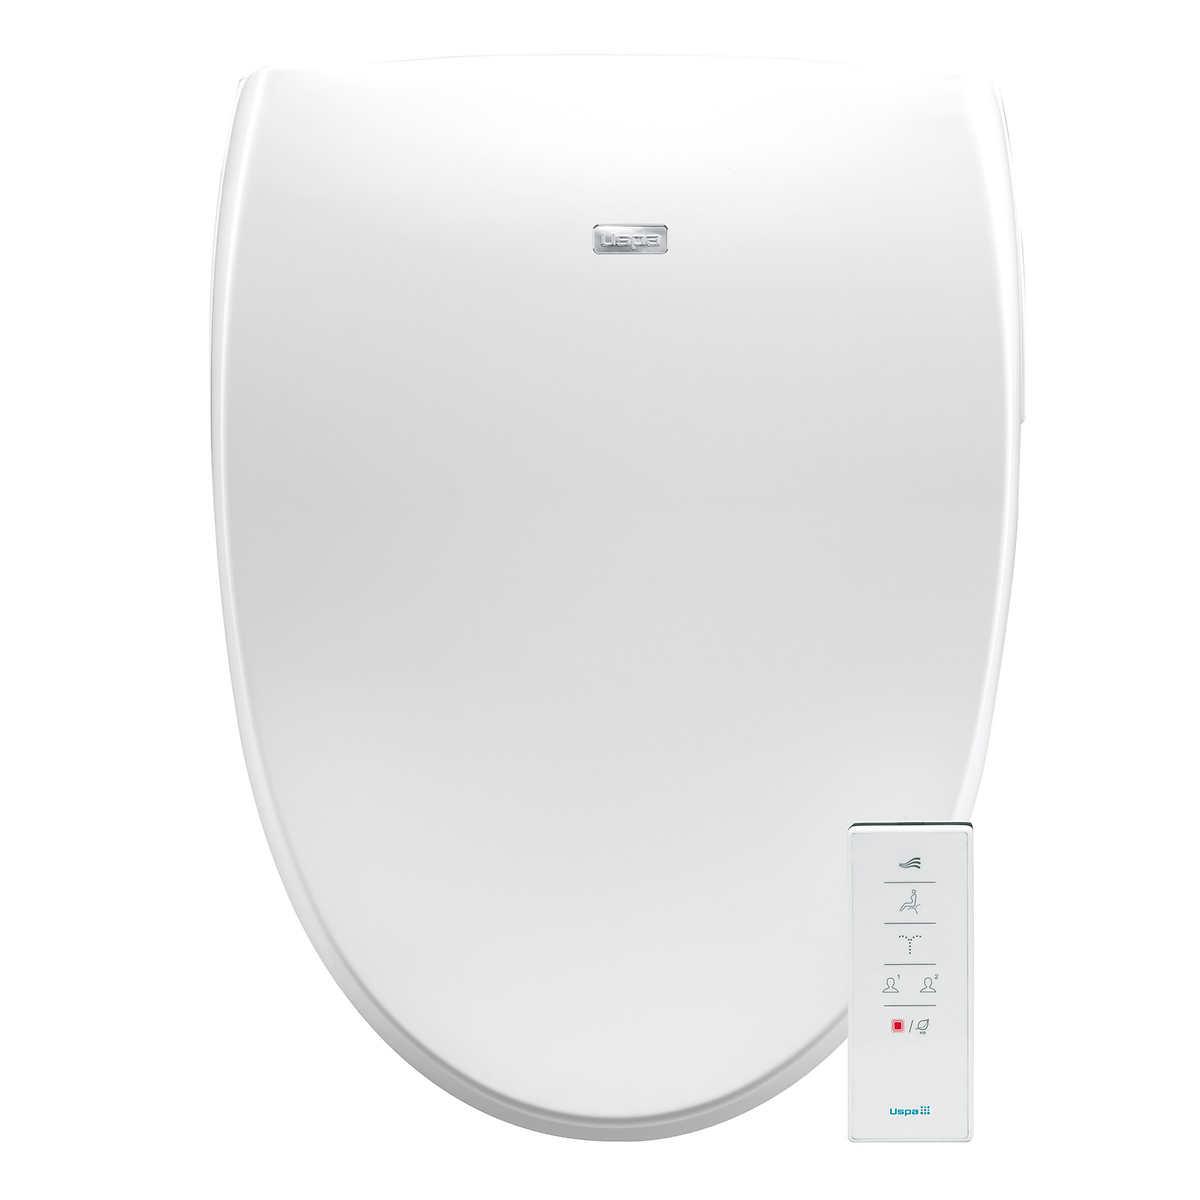 Bio Bidet A8 Serenity Smart Bidet Toilet Seat 4-30/5-27 $249.99